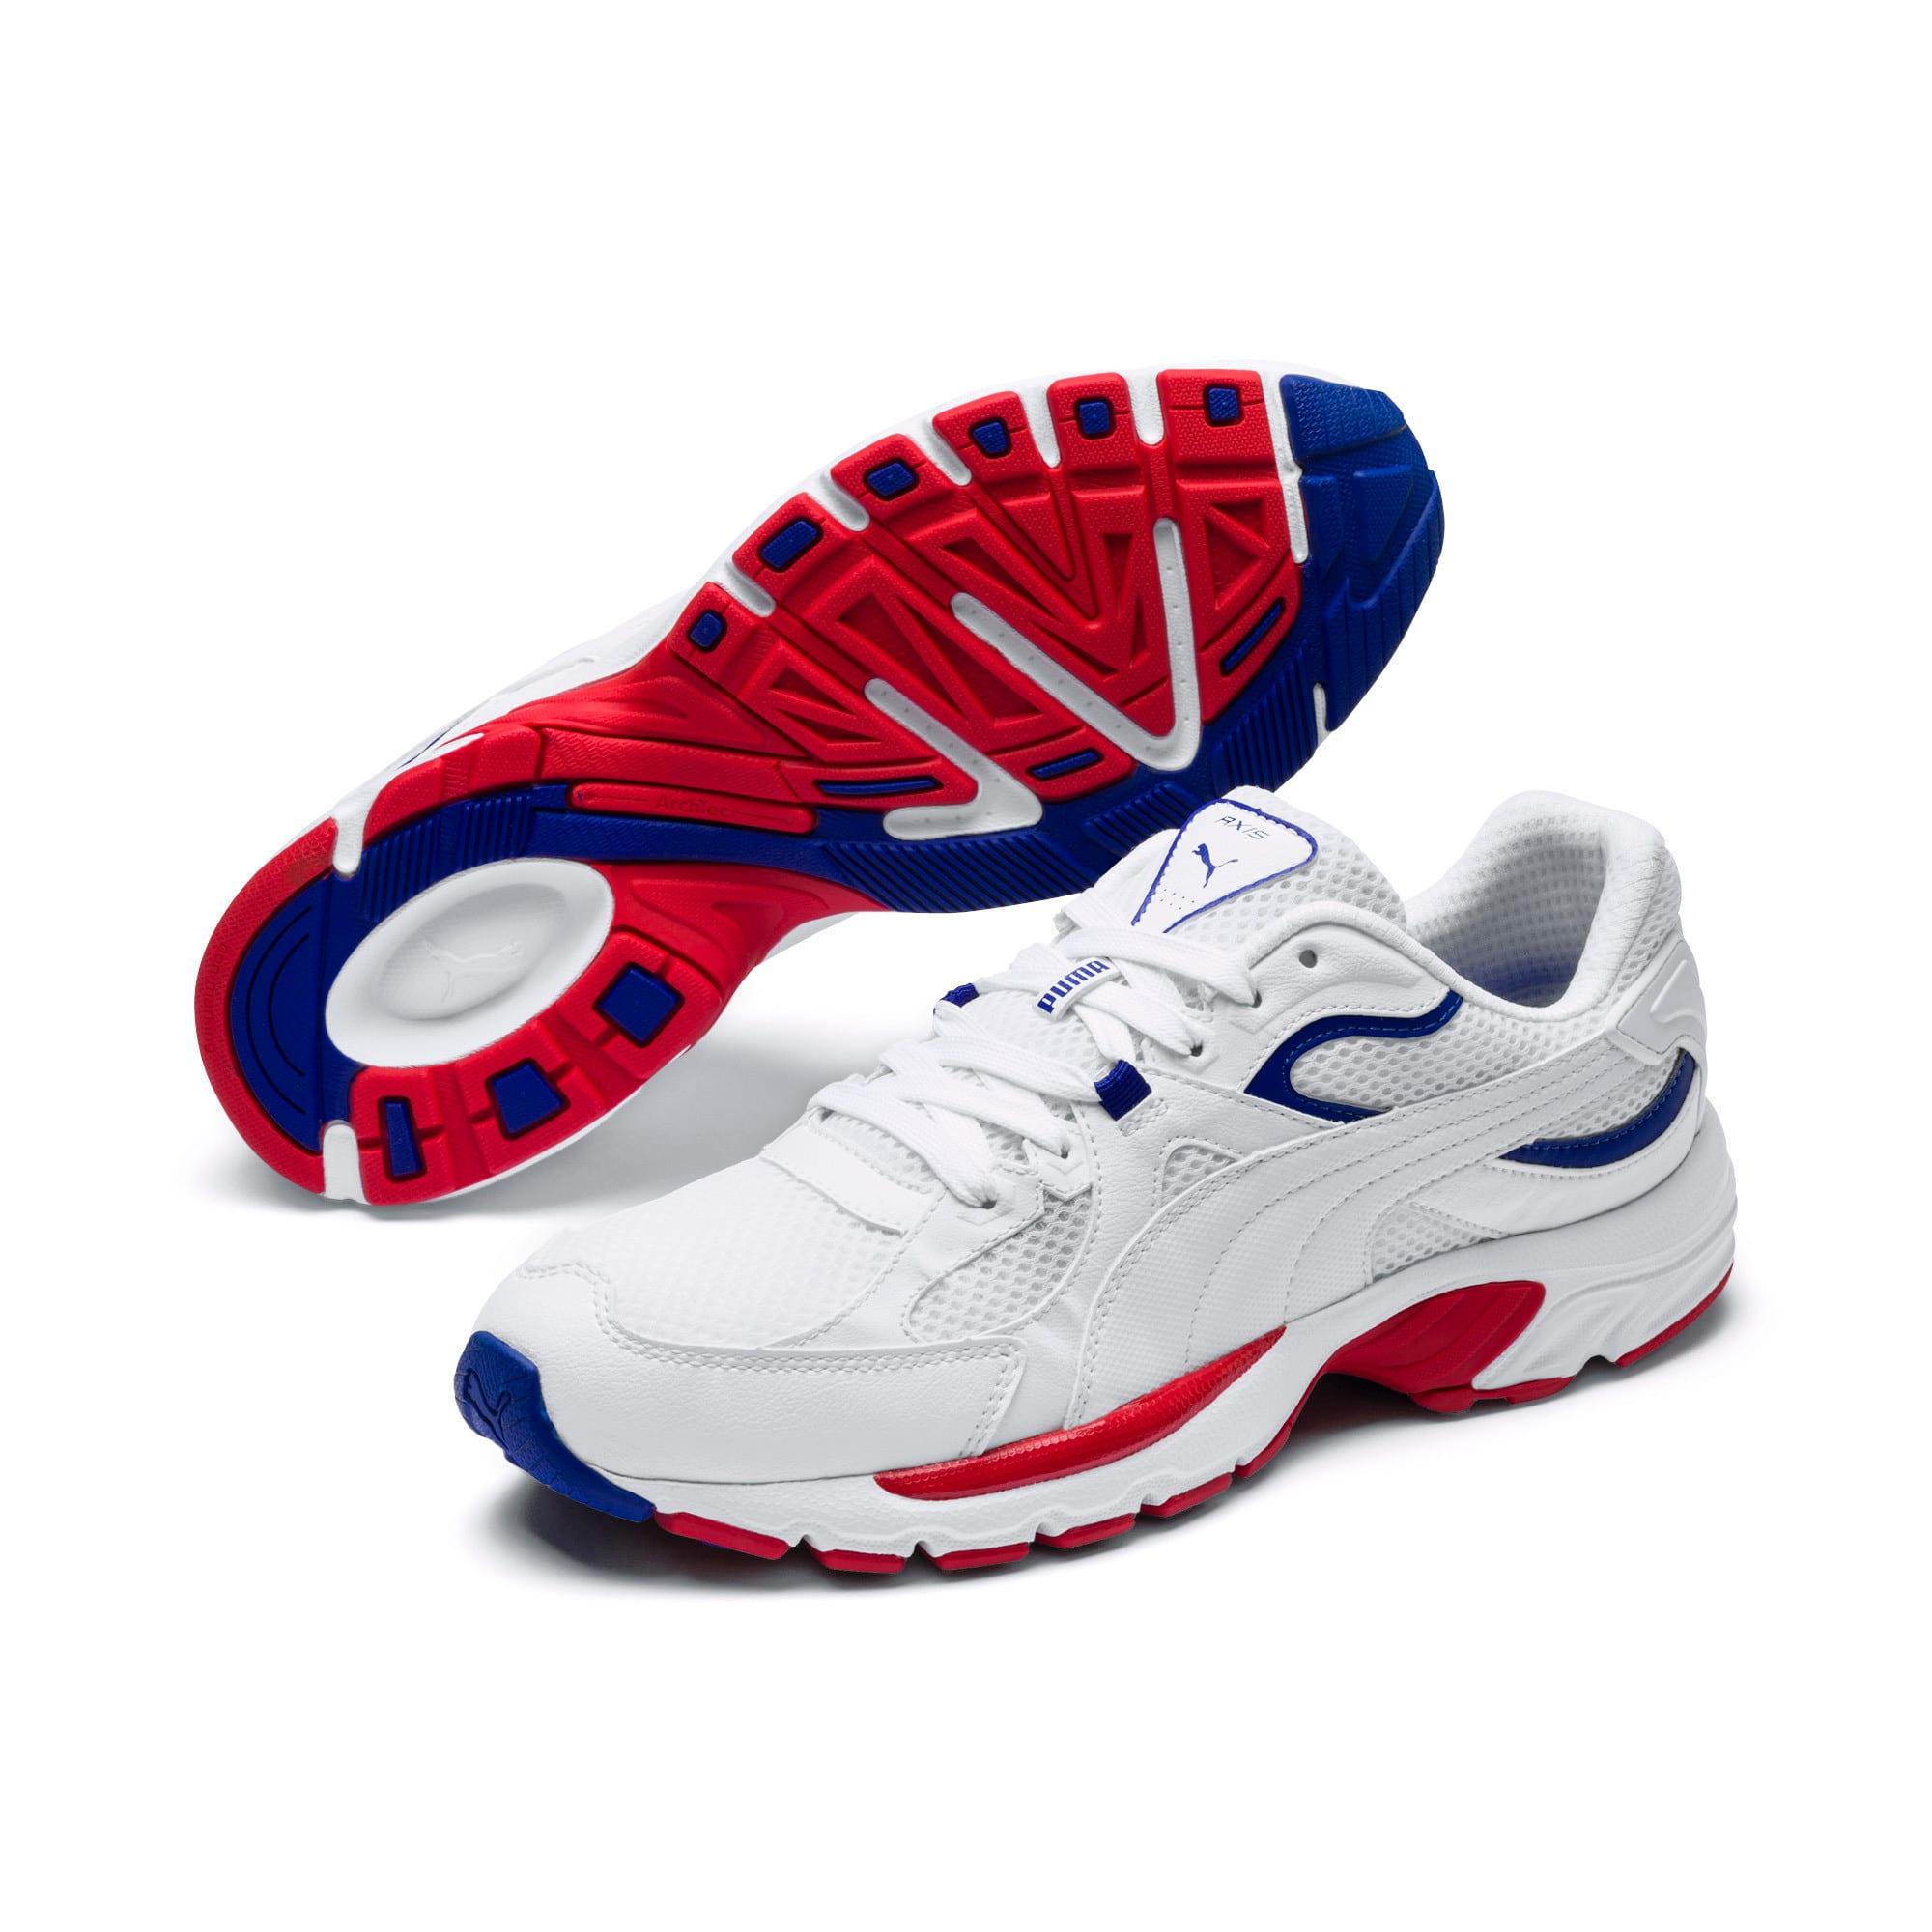 Thumbnail 2 of Axis Plus 90s Sneakers, Puma White-Puma White, medium